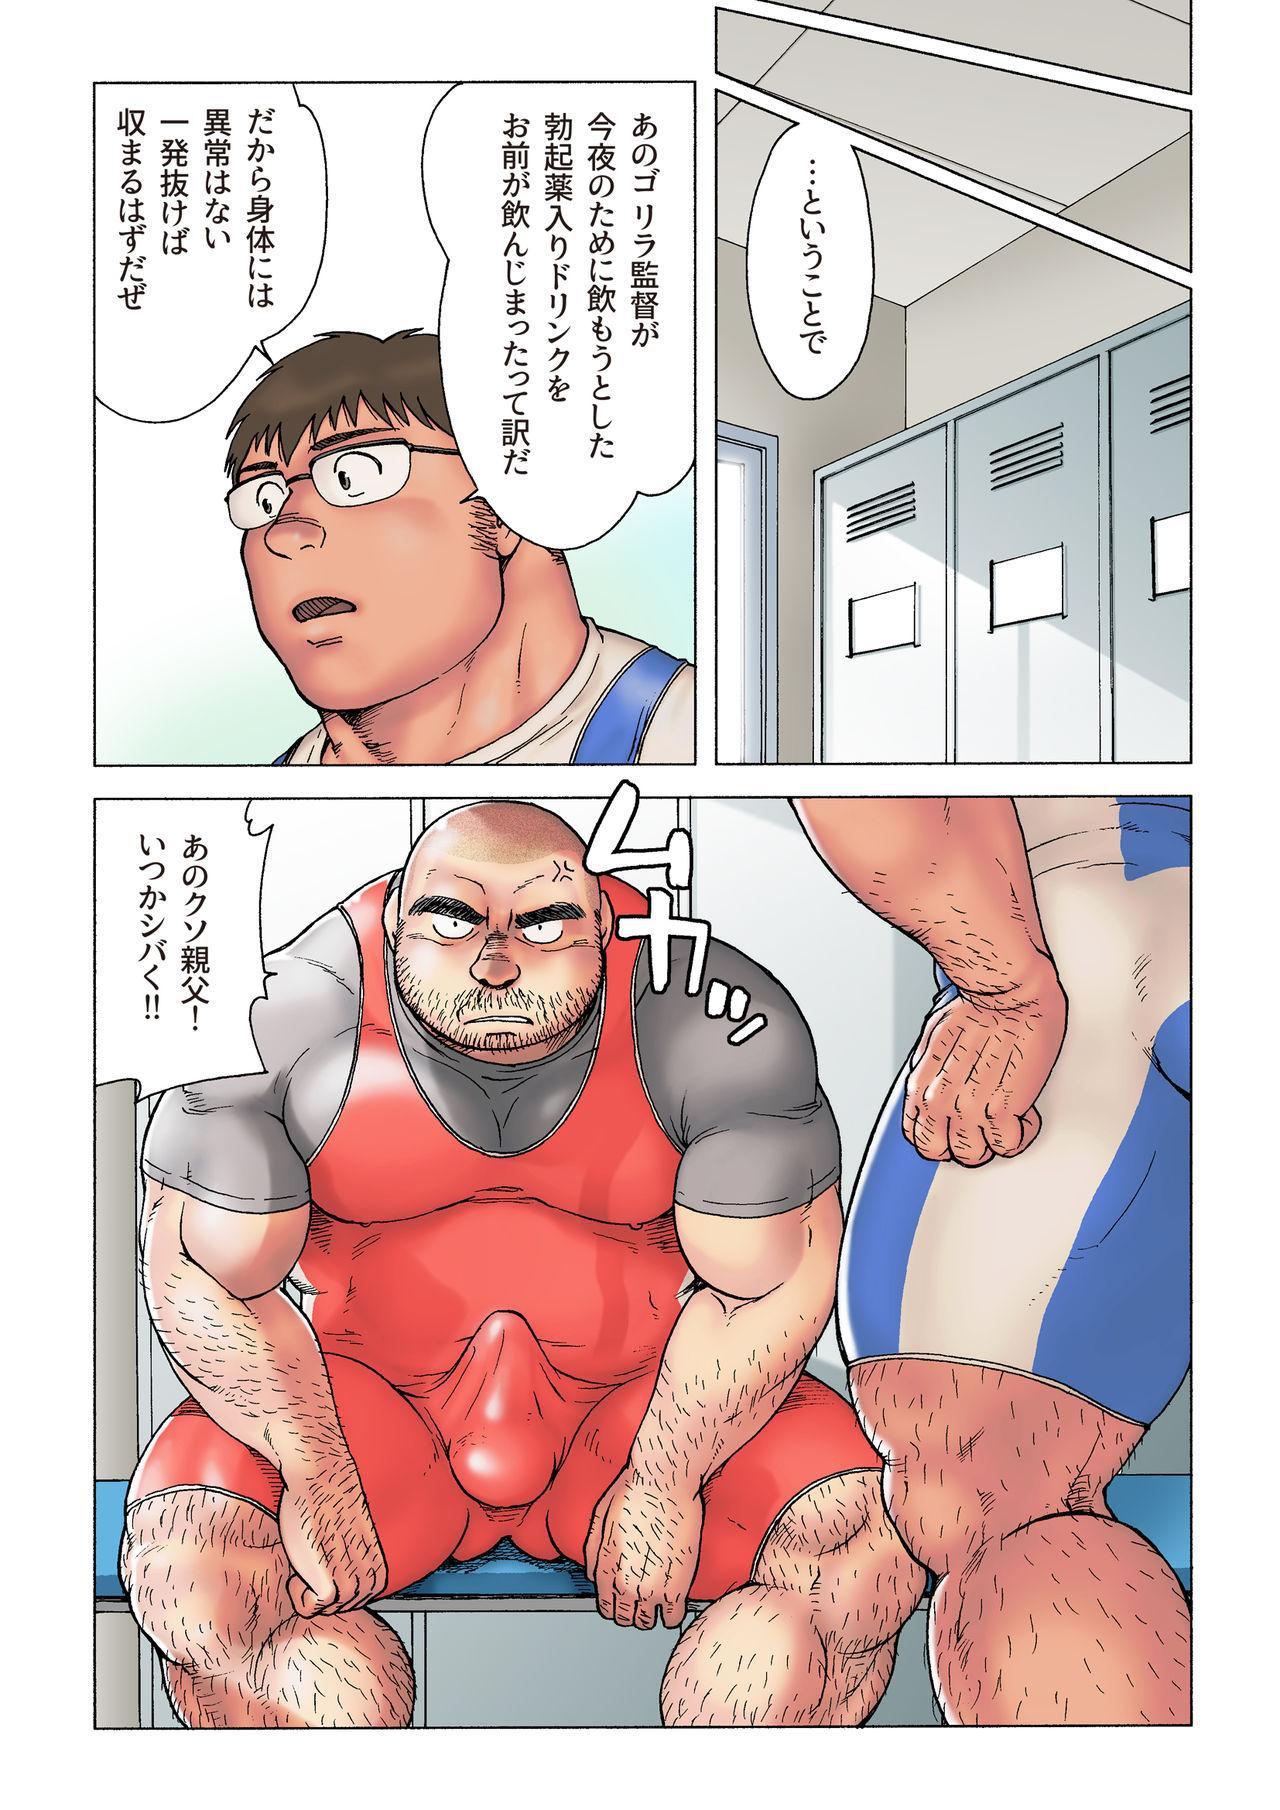 Danshi Koukousei Weightlifter Shiai-chuu, Osae kirenai Wakai Takeri 18